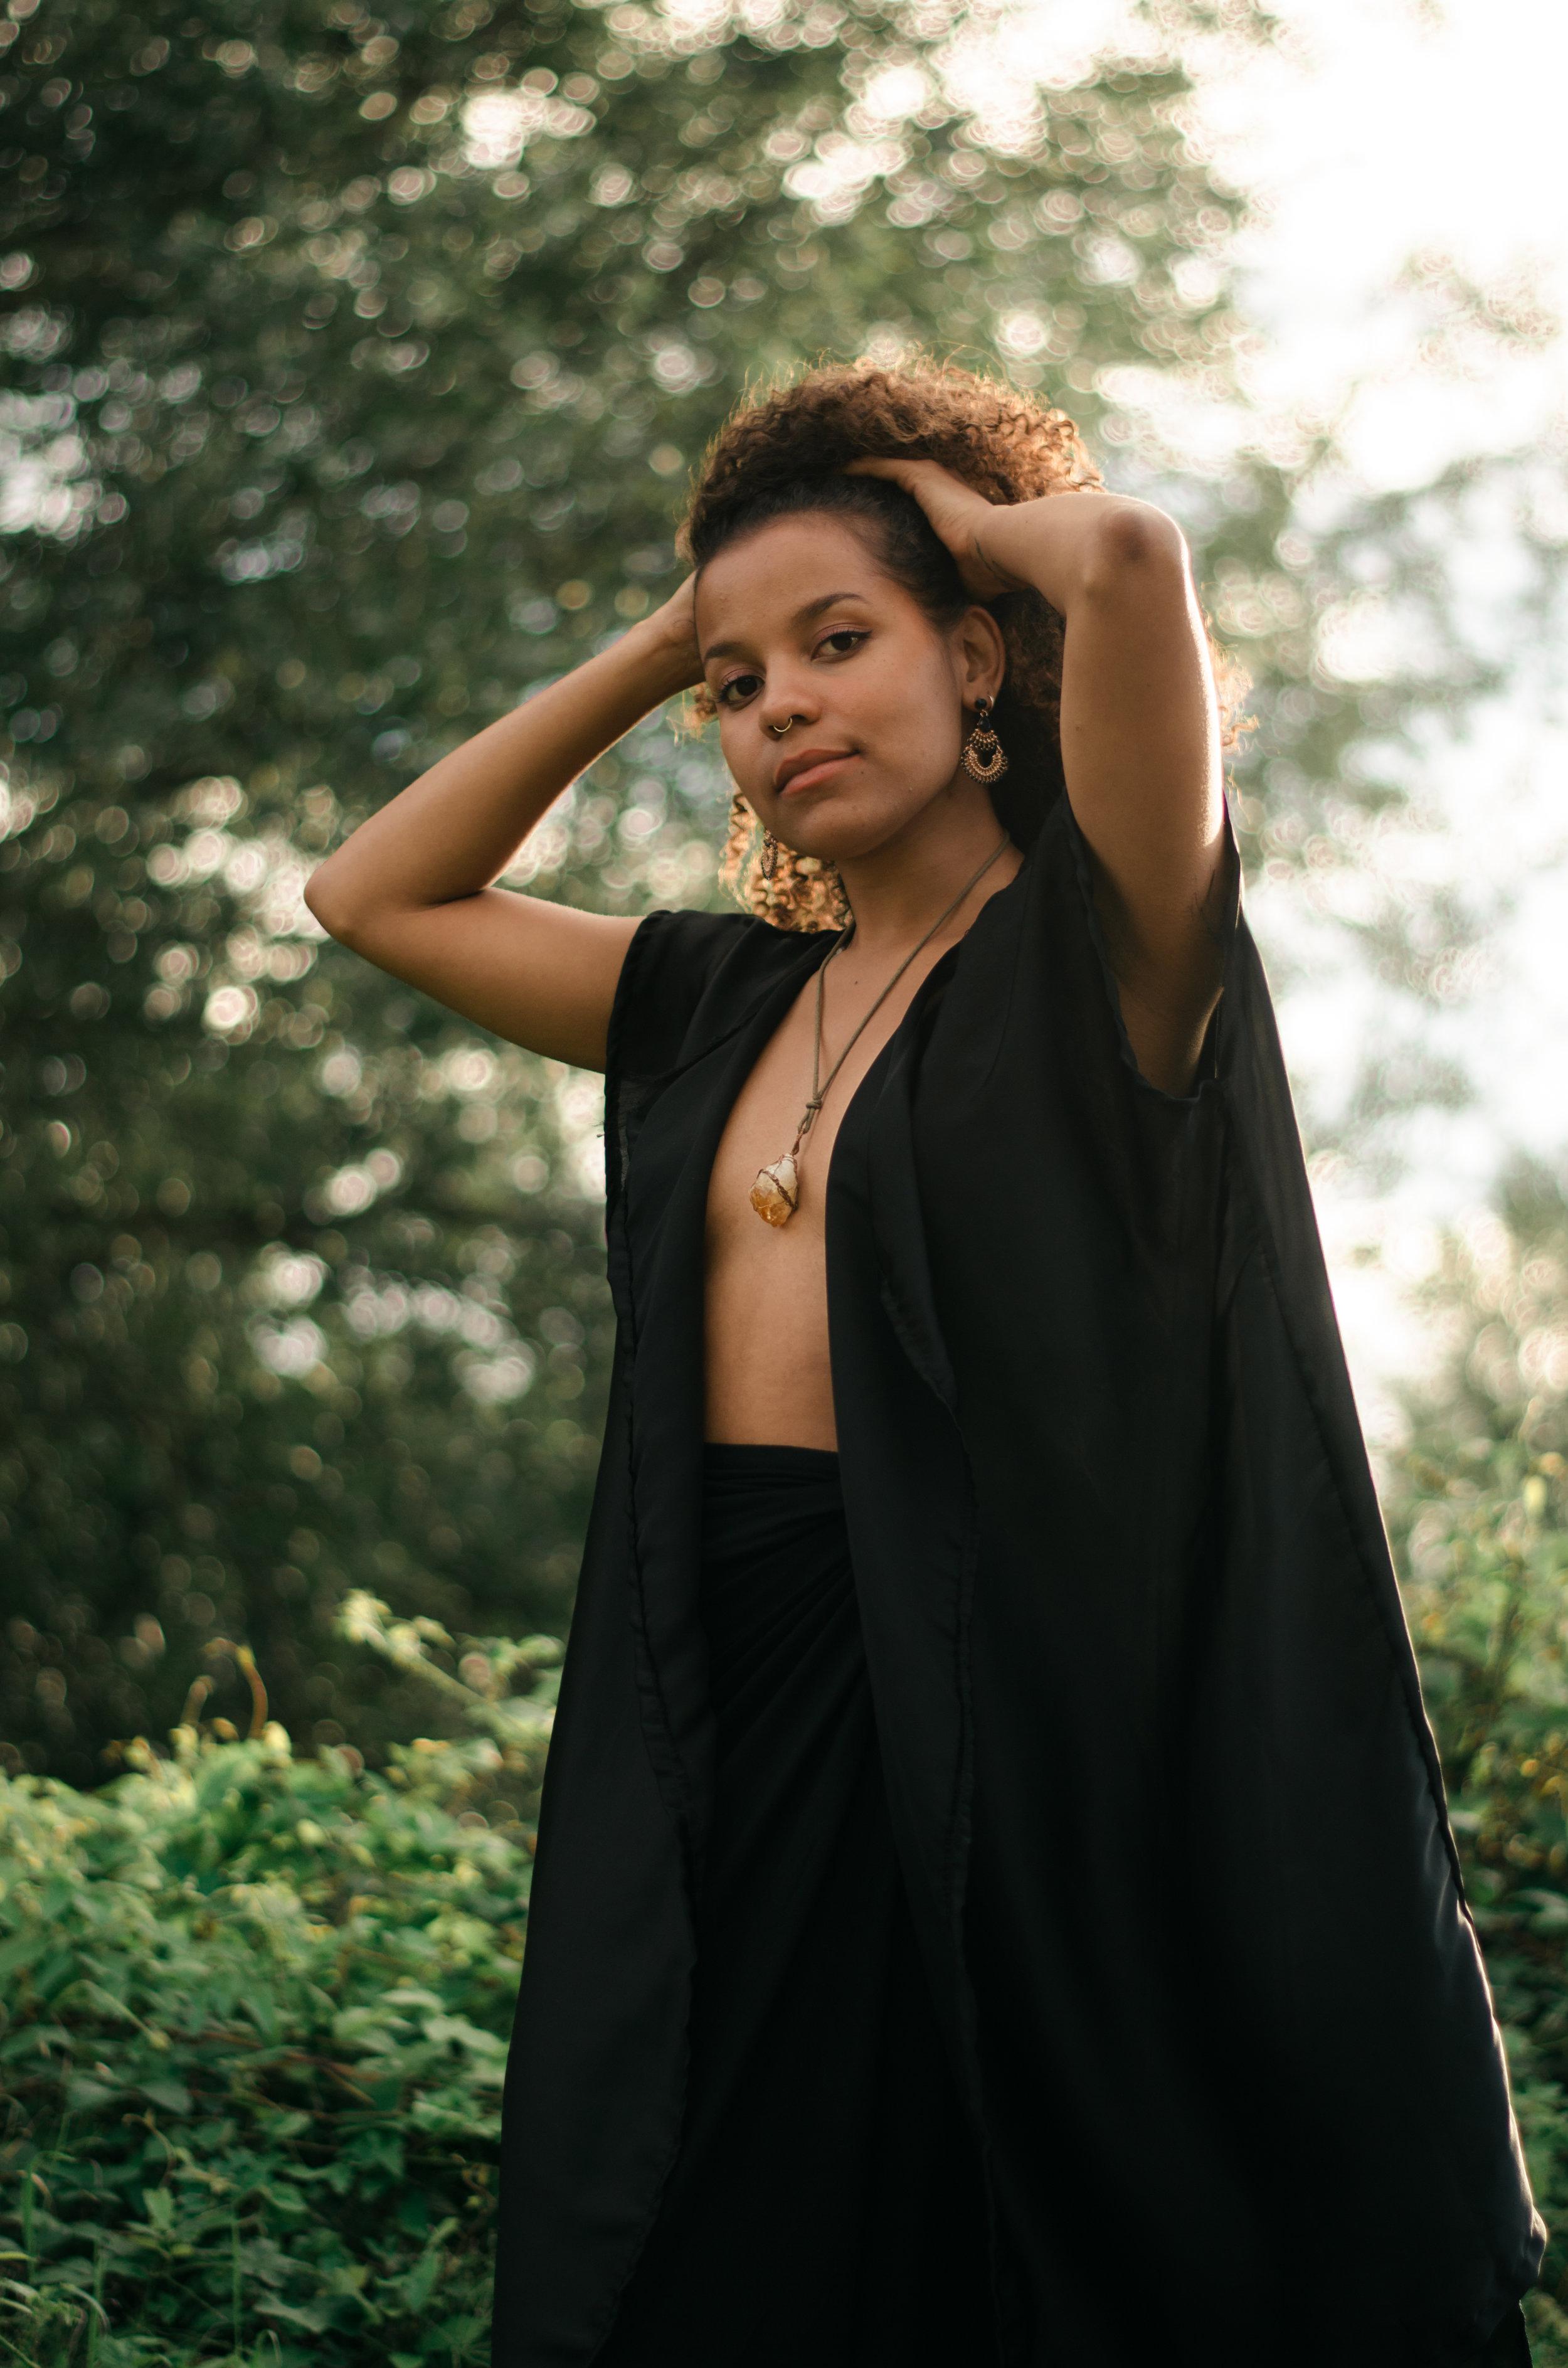 Inka-Portrait-Session-Aiste-Saulyte-Photography-17-07-30-200.jpg